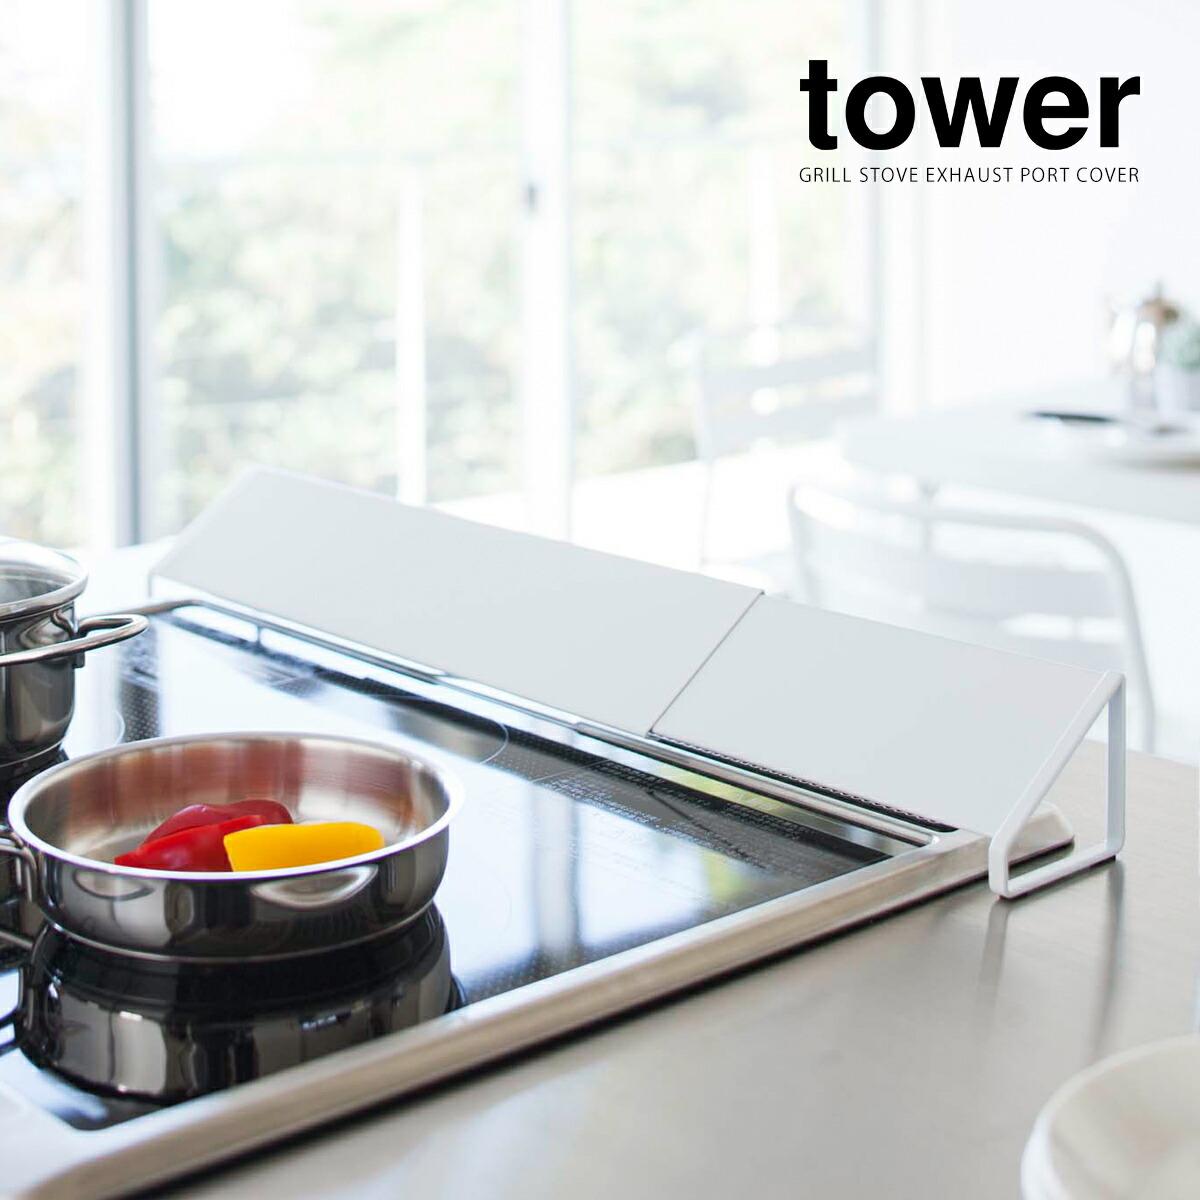 tower / タワー 排気口カバー 油汚れ防止 キッチン 掃除 グリル IH コンロ